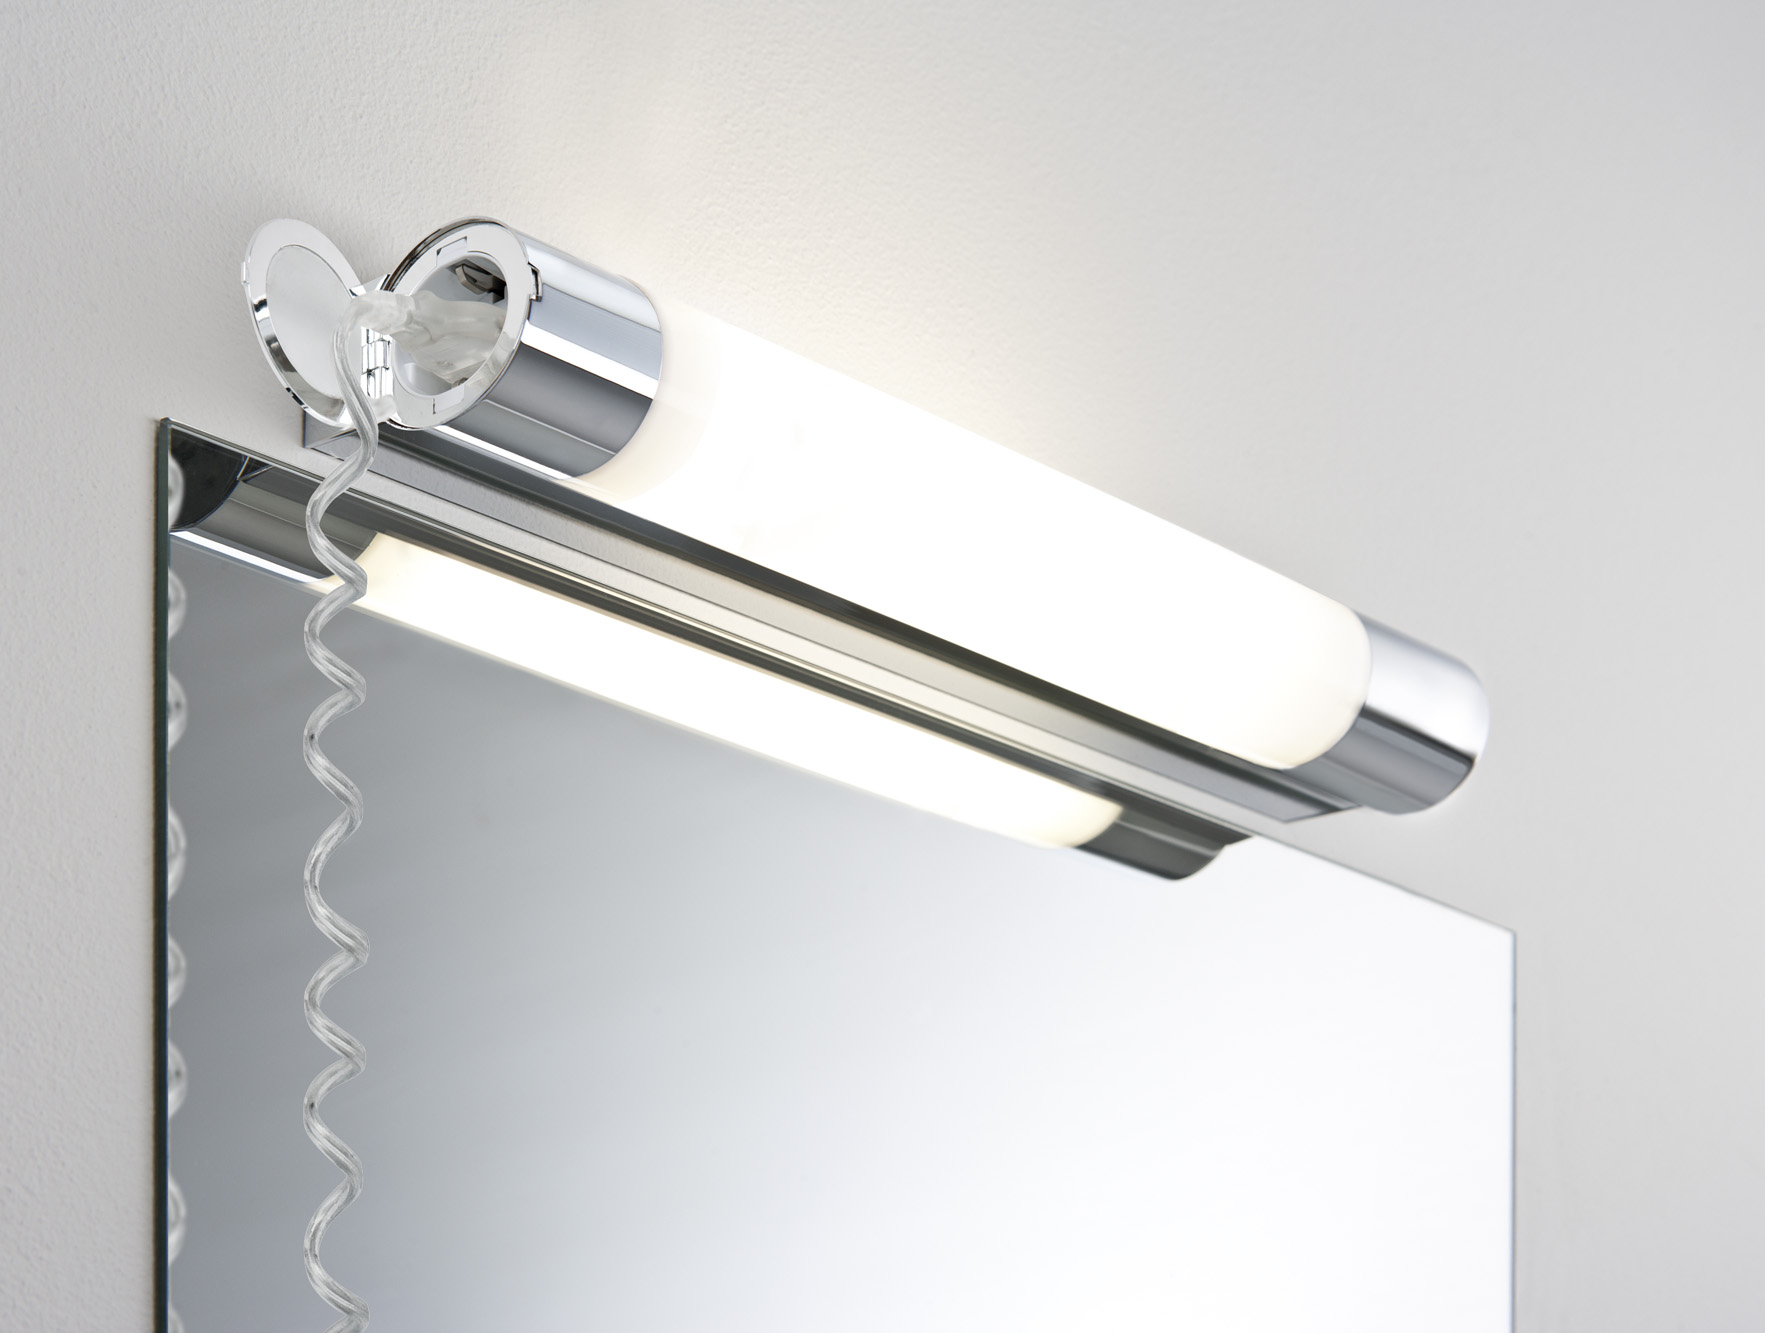 Best Lampe Salle De Bain Avec Interrupteur Gallery - Design Trends ...